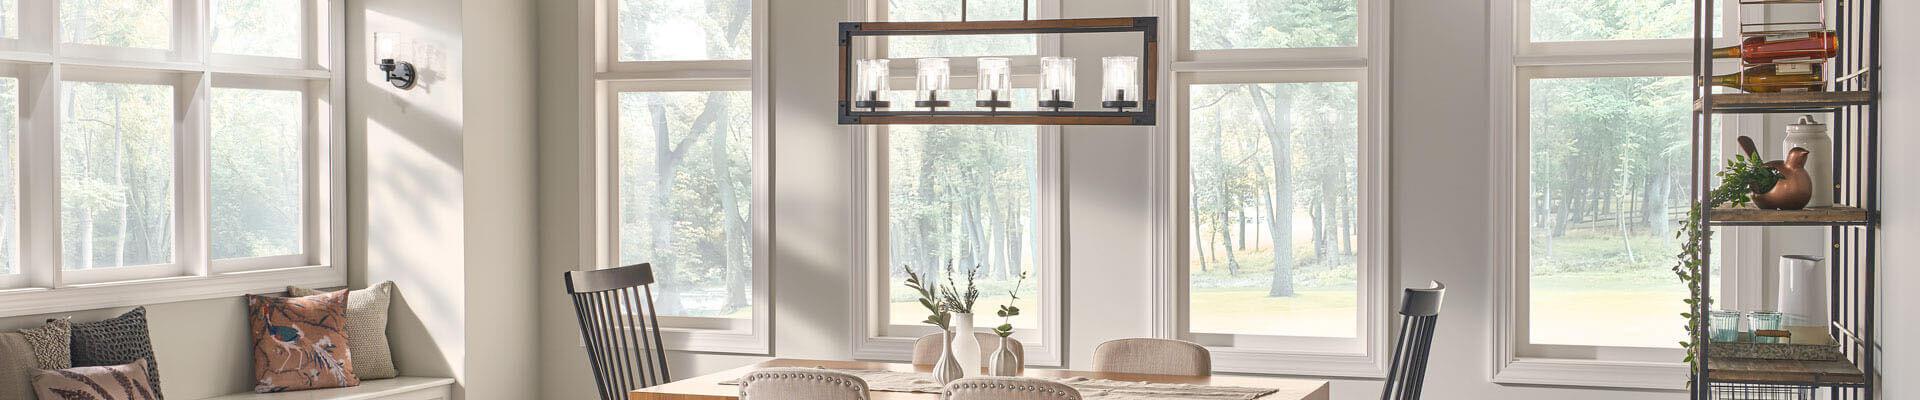 Dining Room Cleara Kichler Lighting